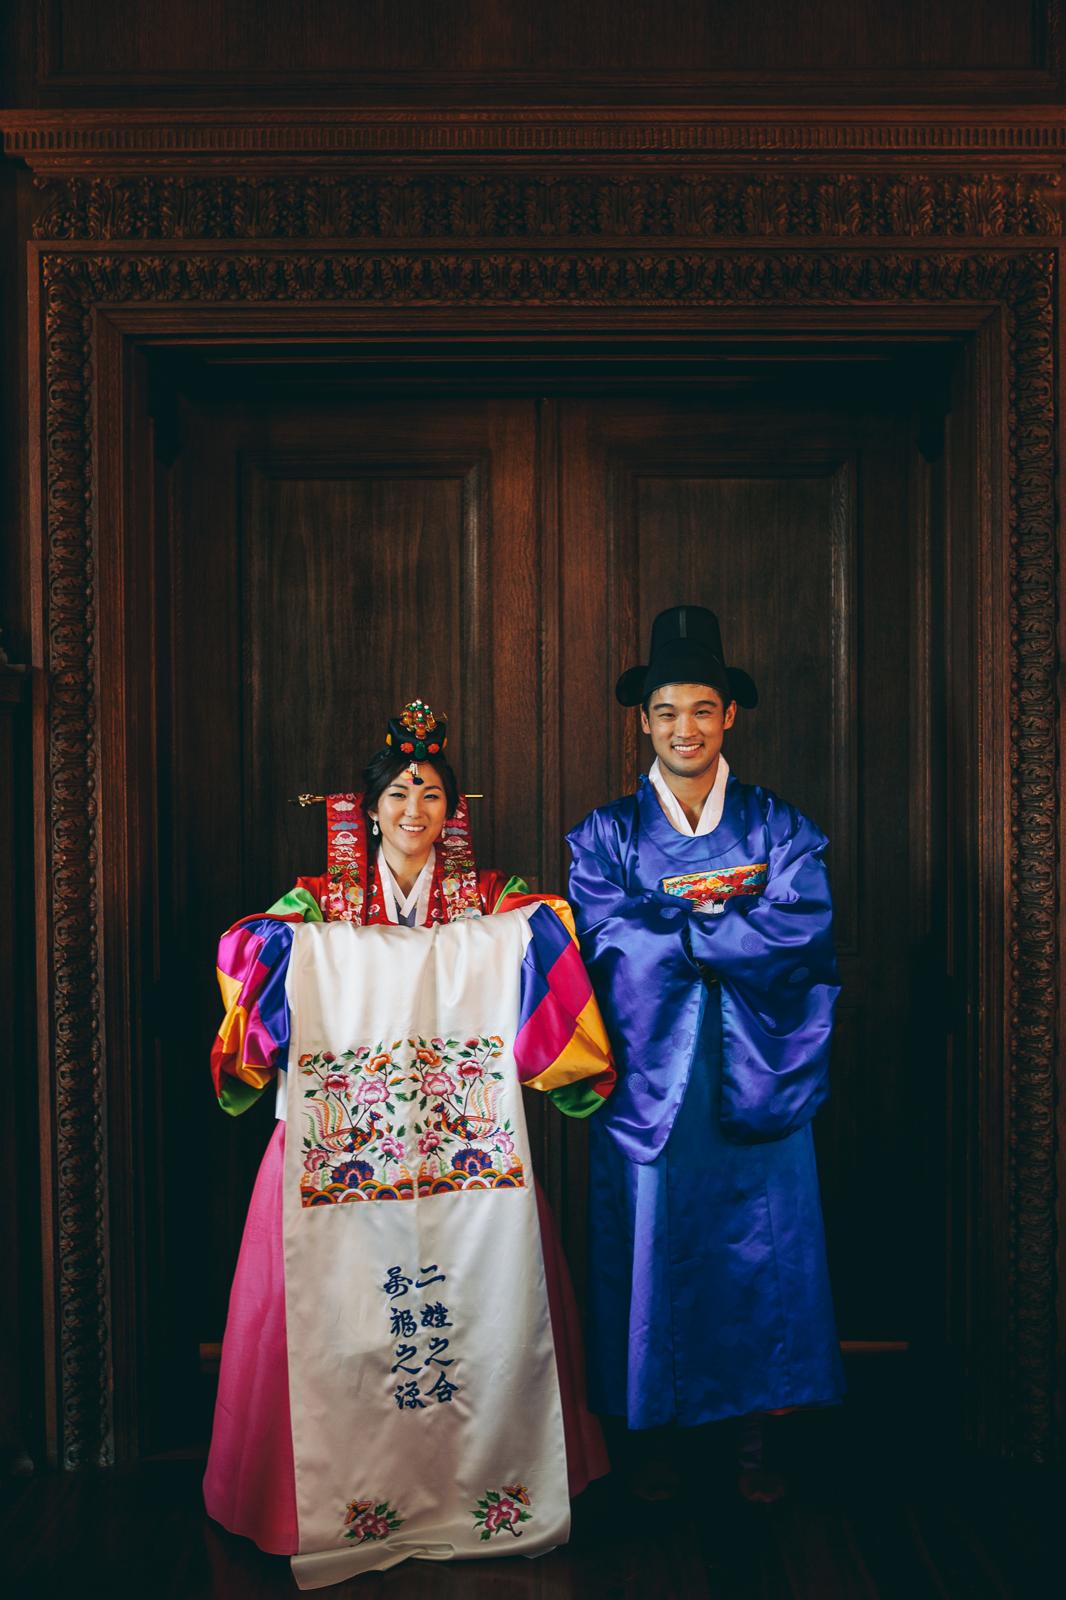 kohl_manison_wedding_photography_sarah_eric_ebony_siovhan_bokeh_photography_074.jpg